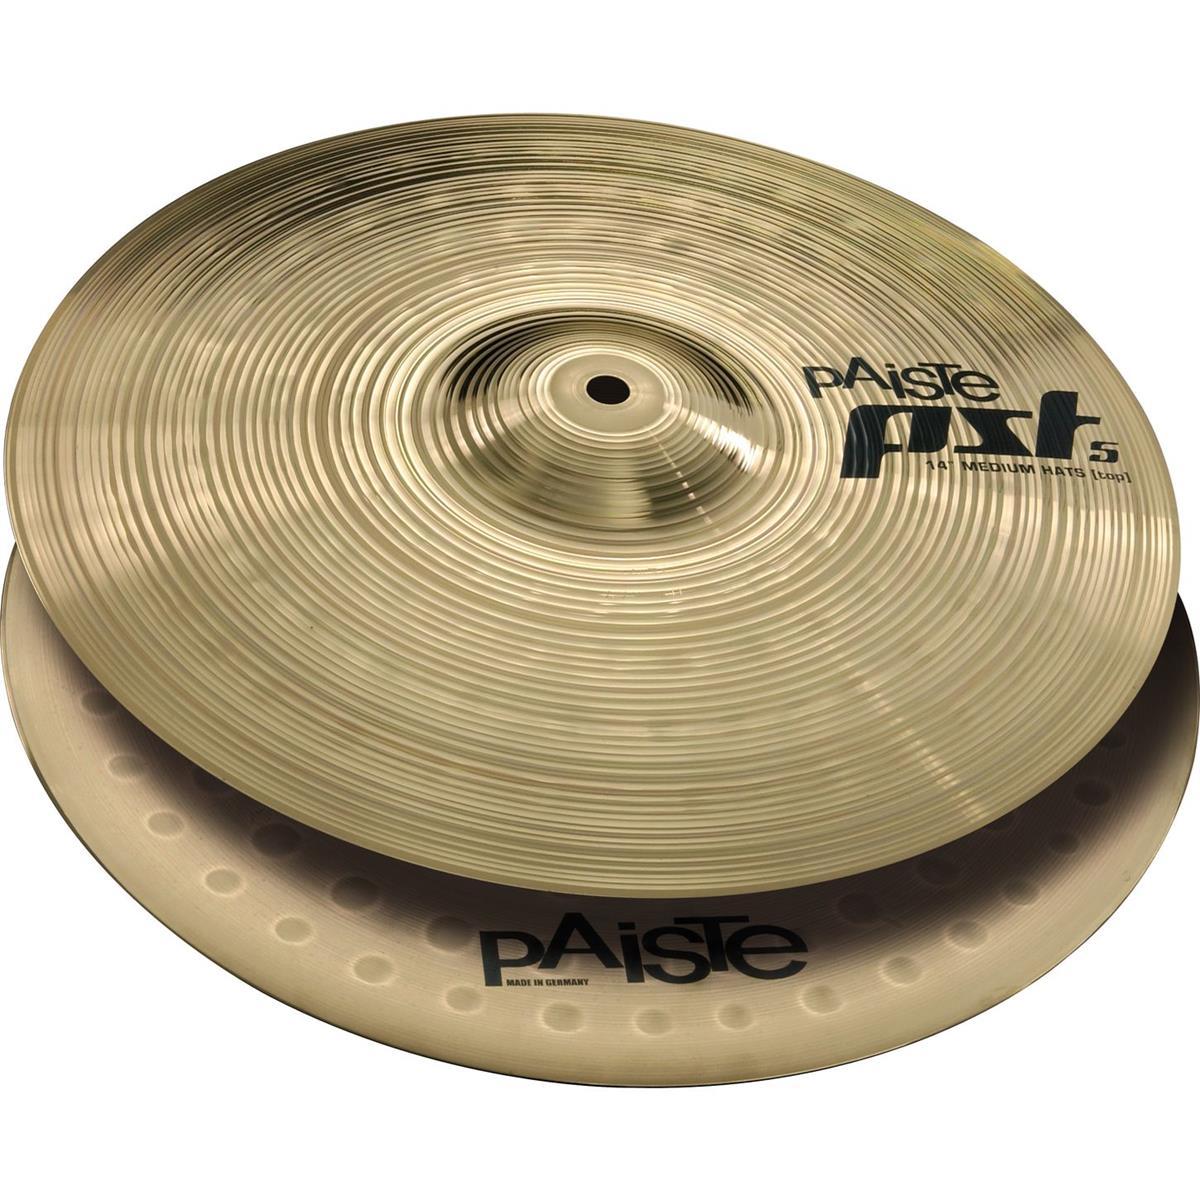 PAISTE-PST5-HI-HAT-14-sku-376